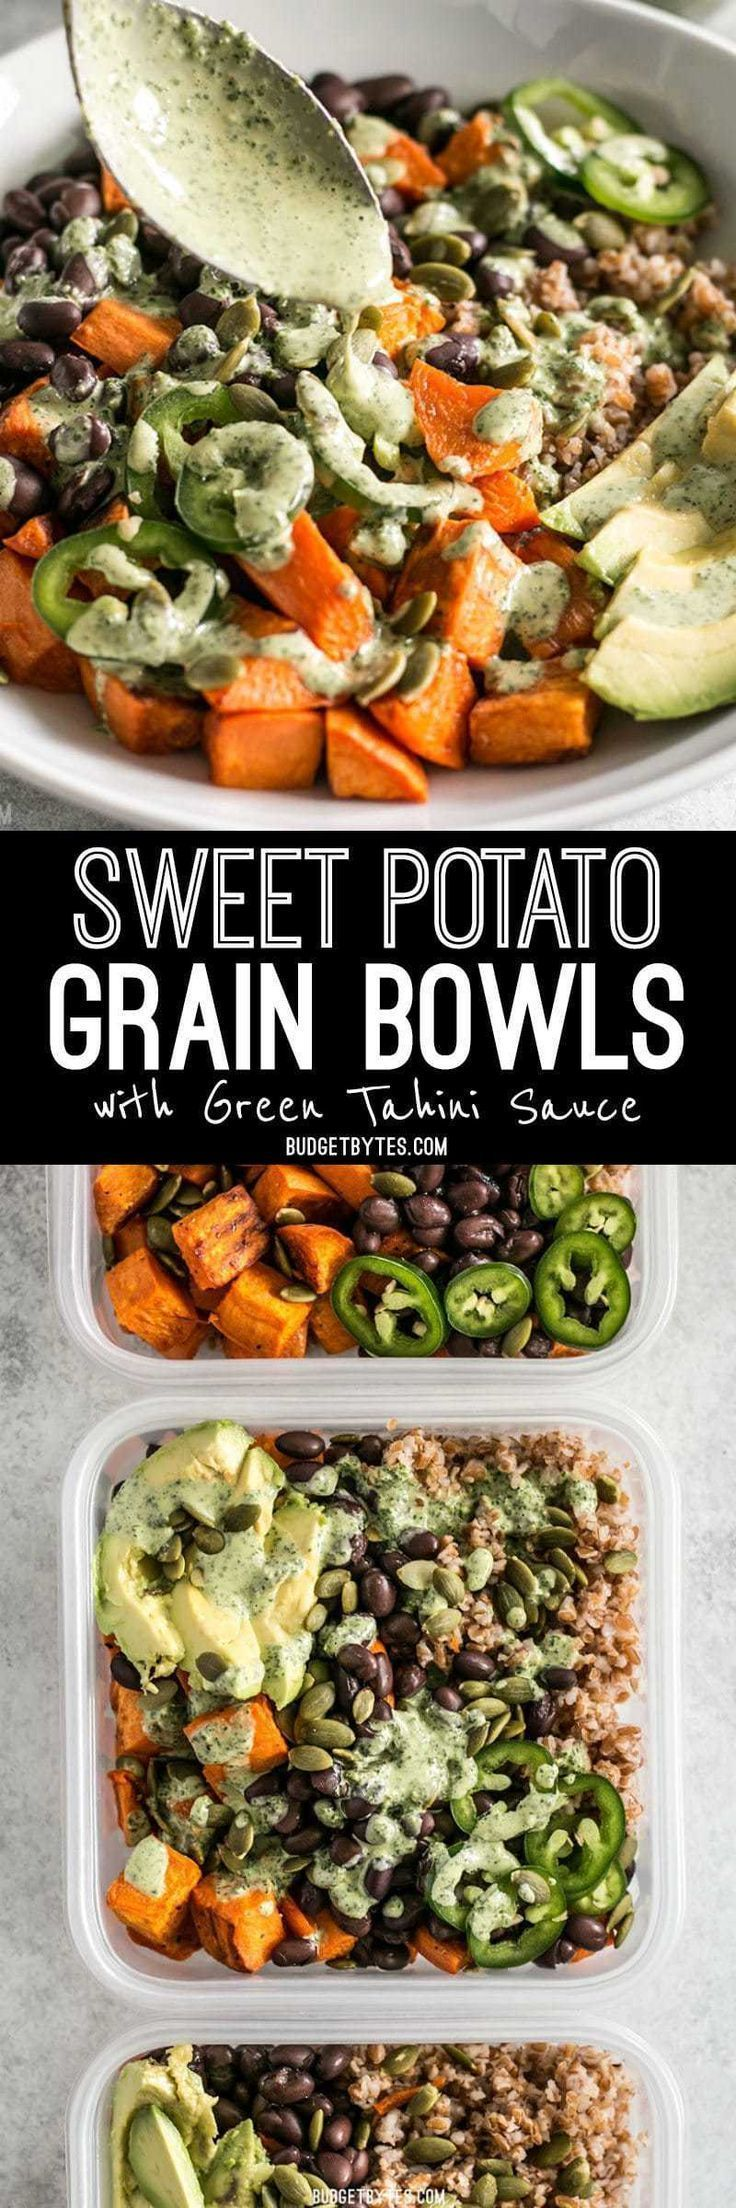 Grain Bowls with Green Tahini Sauce   Sweet Potato Grain Bowls with Green Tahini Sauce  Sweet Potato Grain Bowls with Green Tahini Sauce   Sweet Potato Grain Bowls with G...